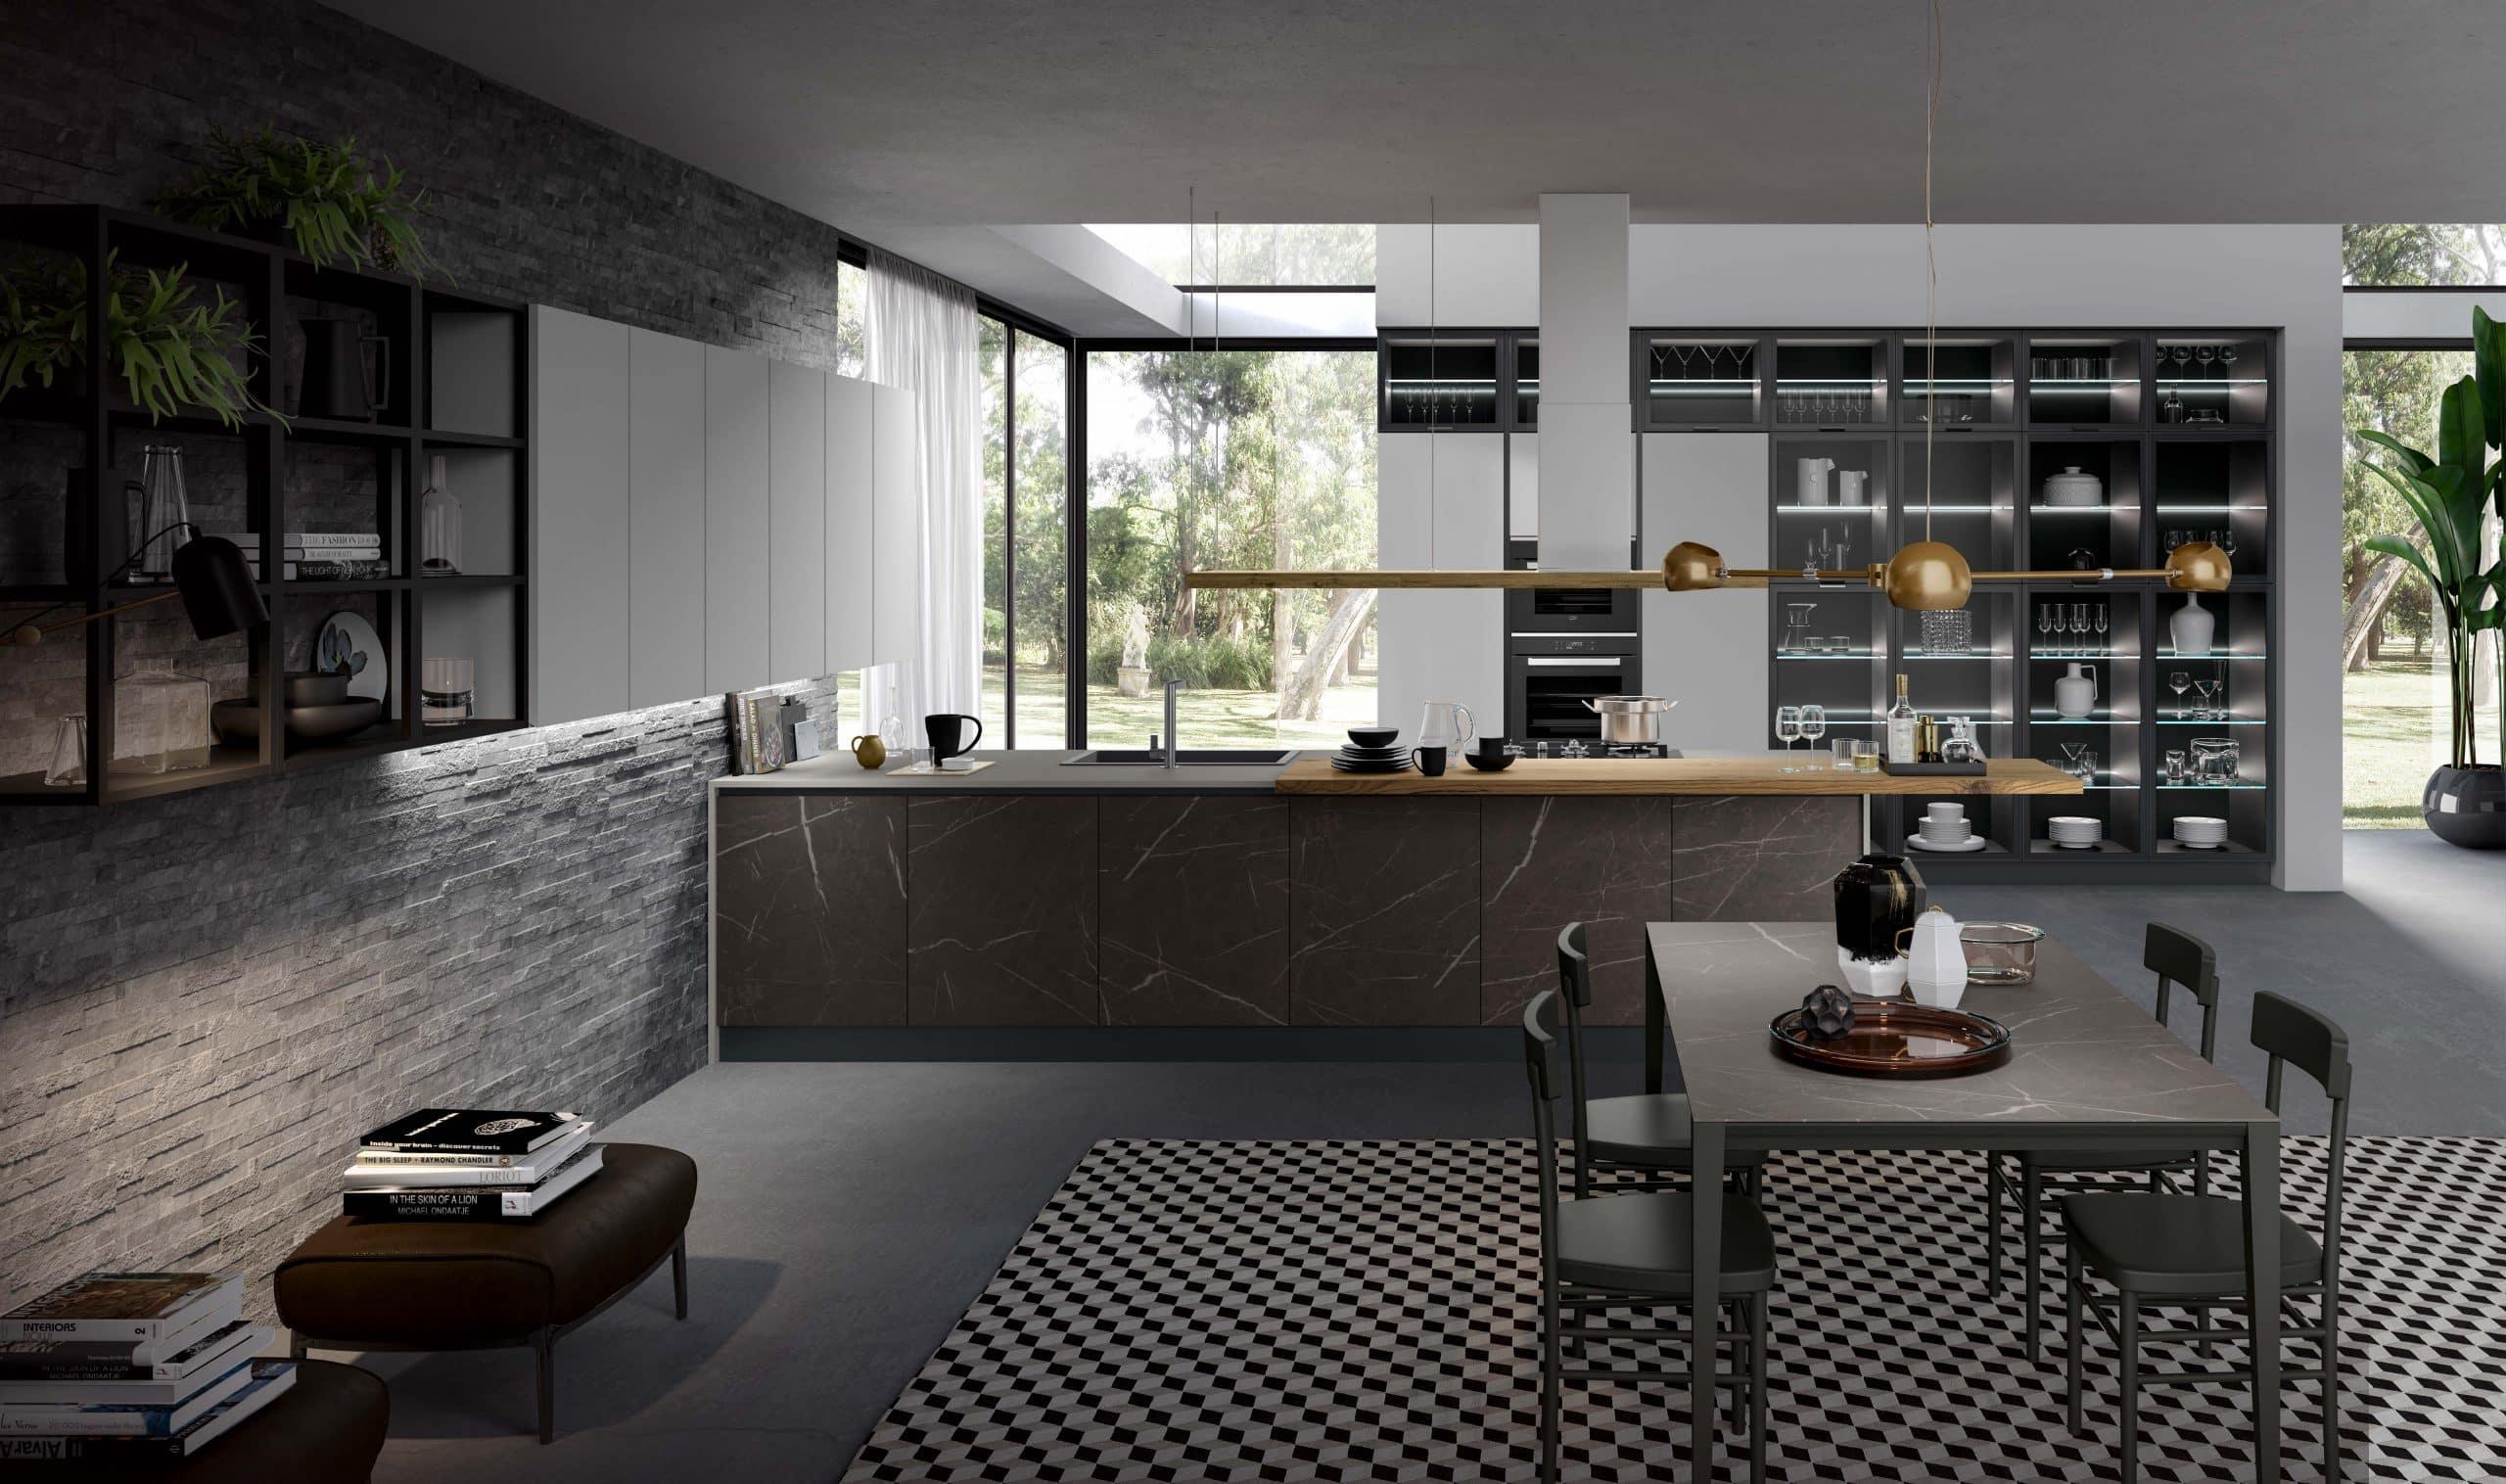 MOBILTURI Zen - Minimalist Kitchen